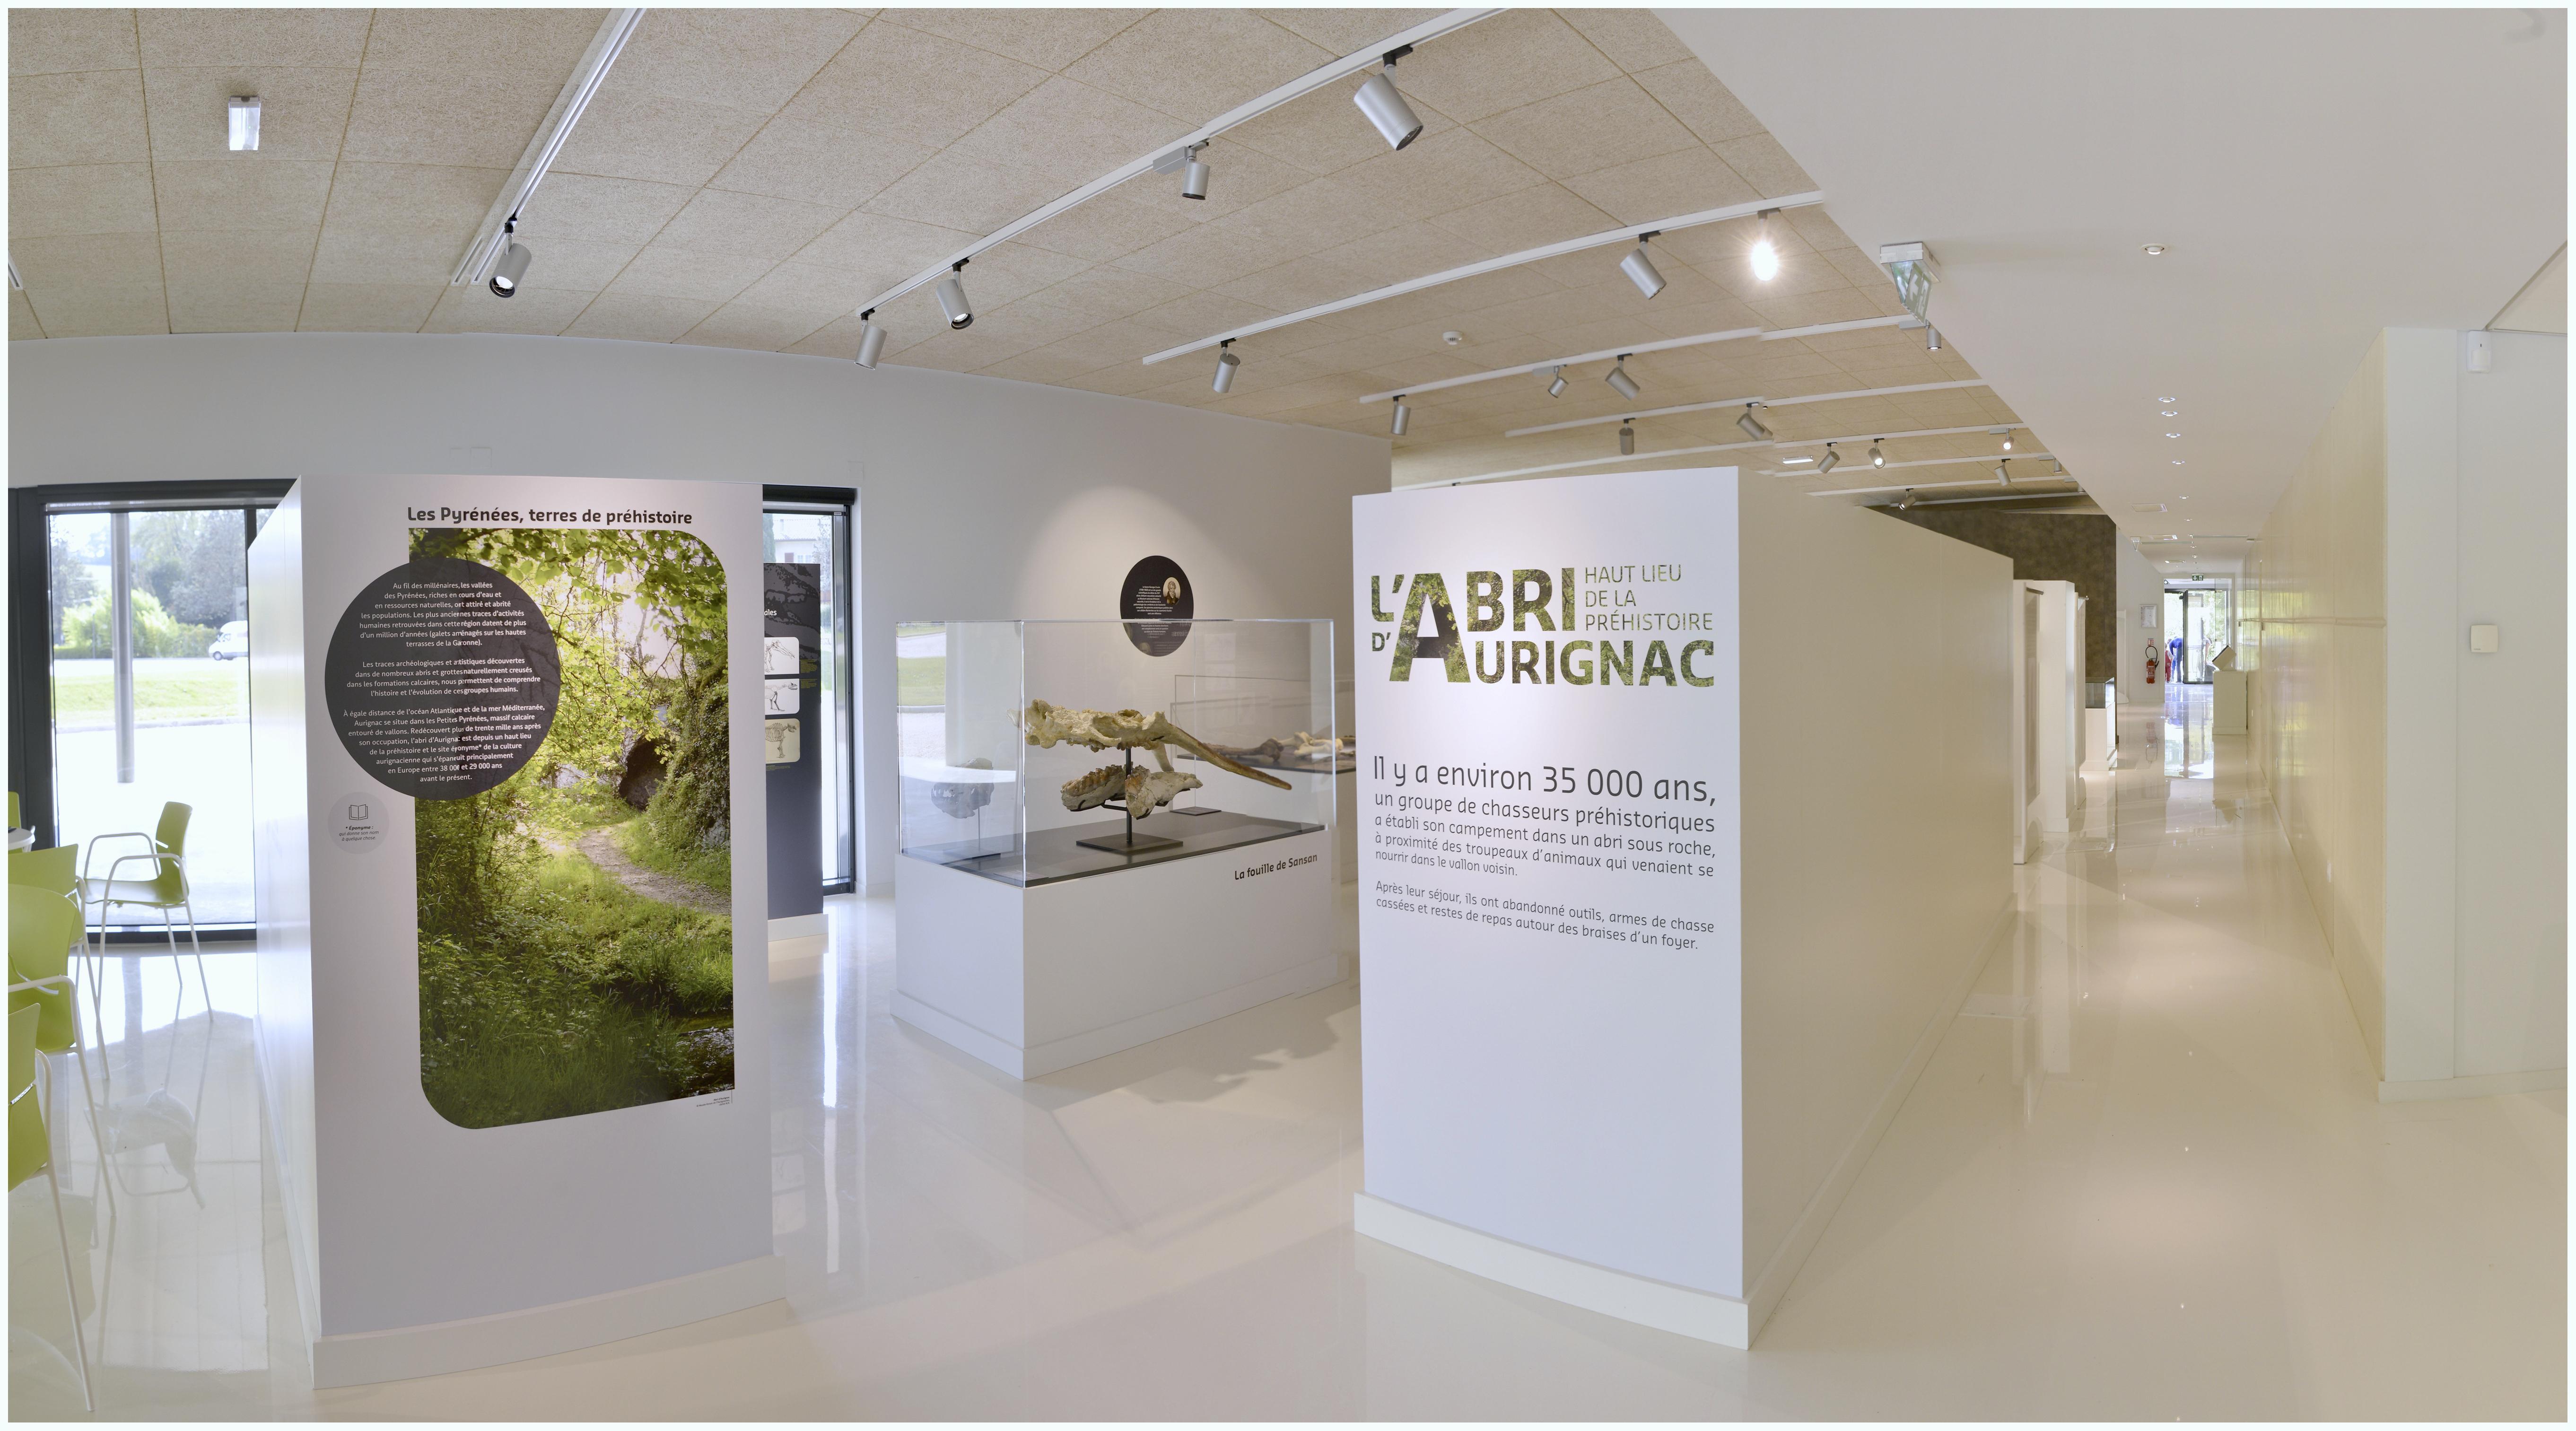 Image : Musee-forum De L'aurignacien